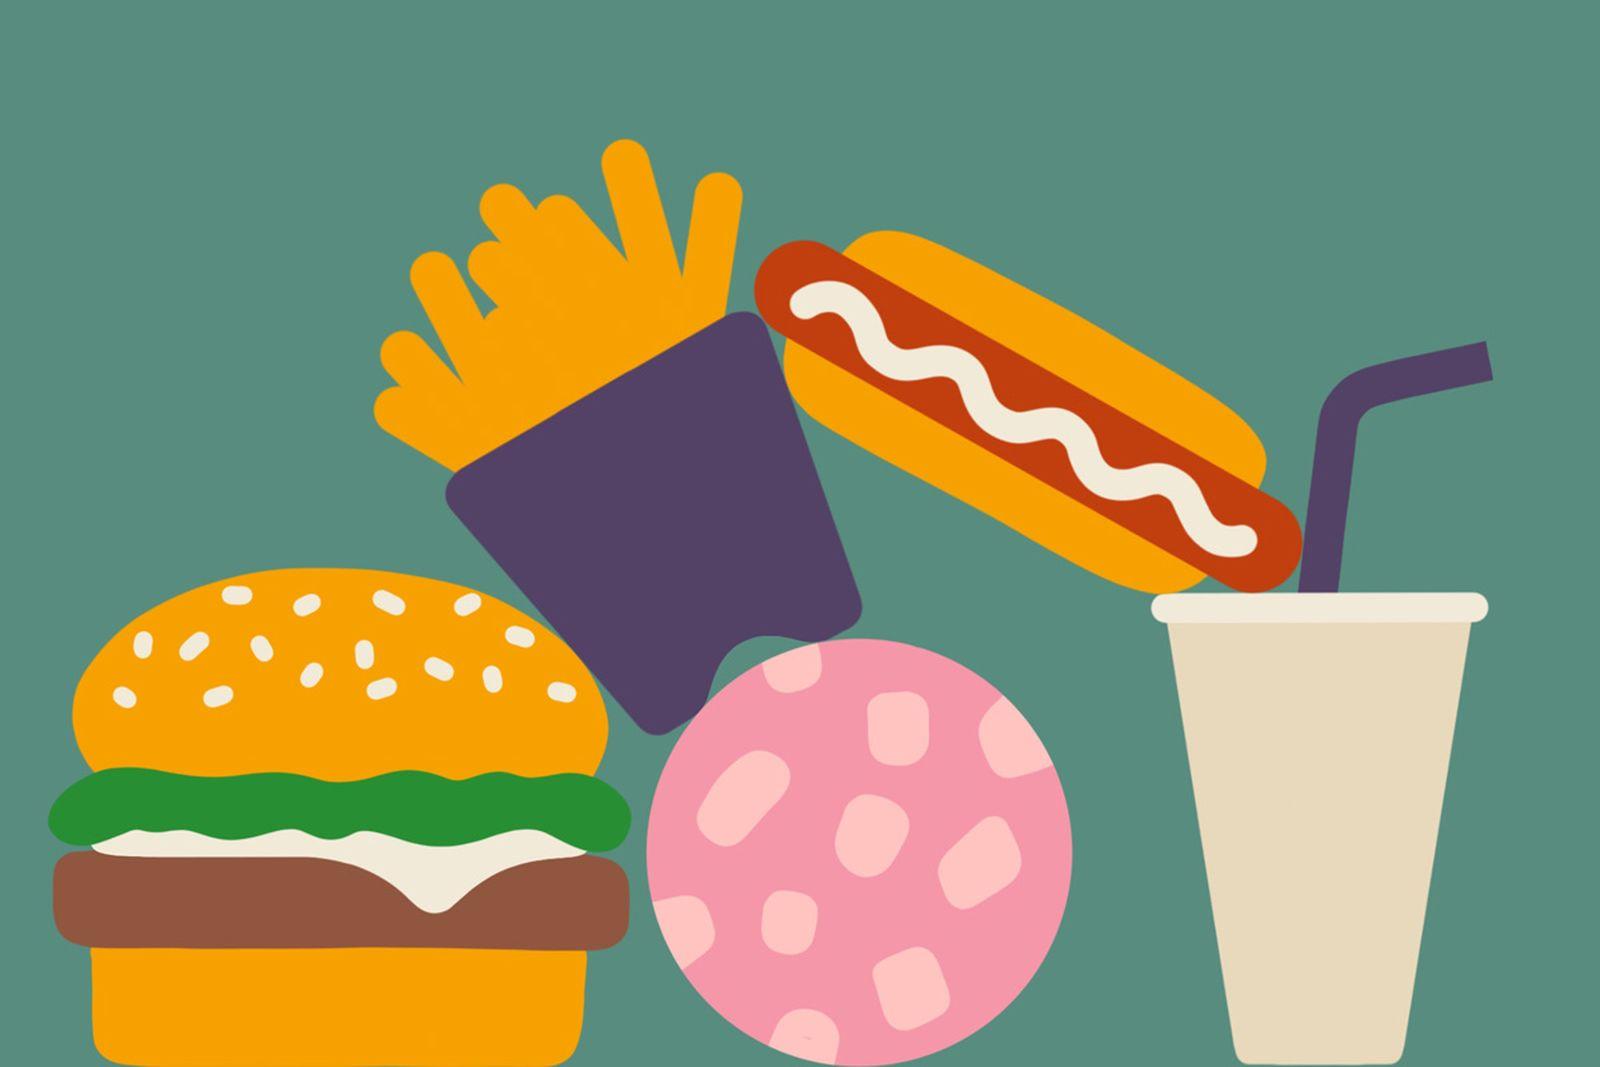 groom service 7 reasons break stop Consuming processed foods Curology